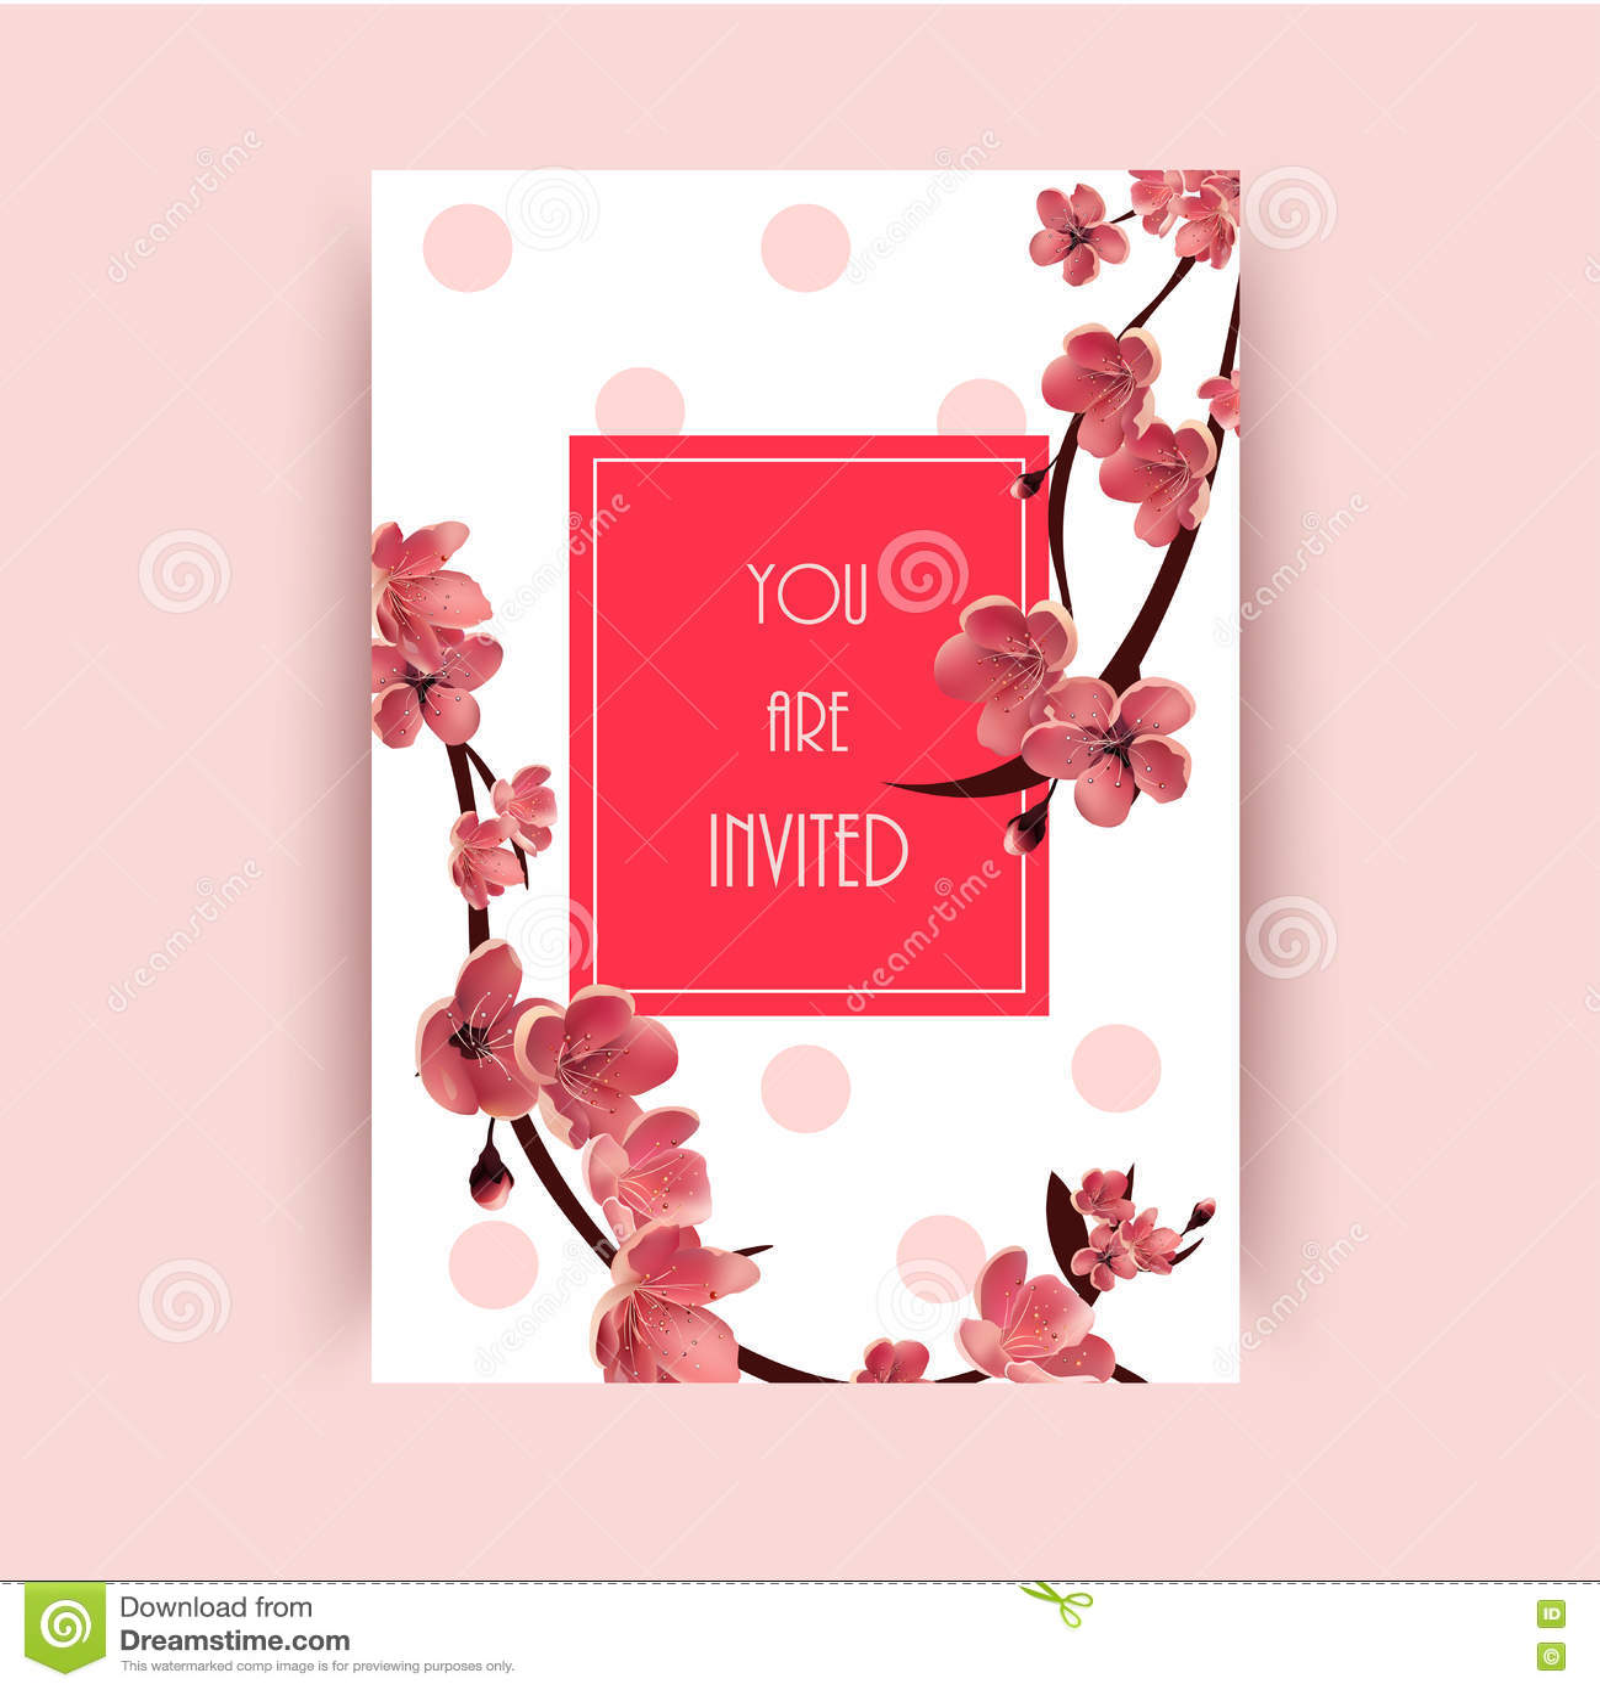 Sakura, Cherry Blossoming Tree Vector Background Illustration. Stock ...